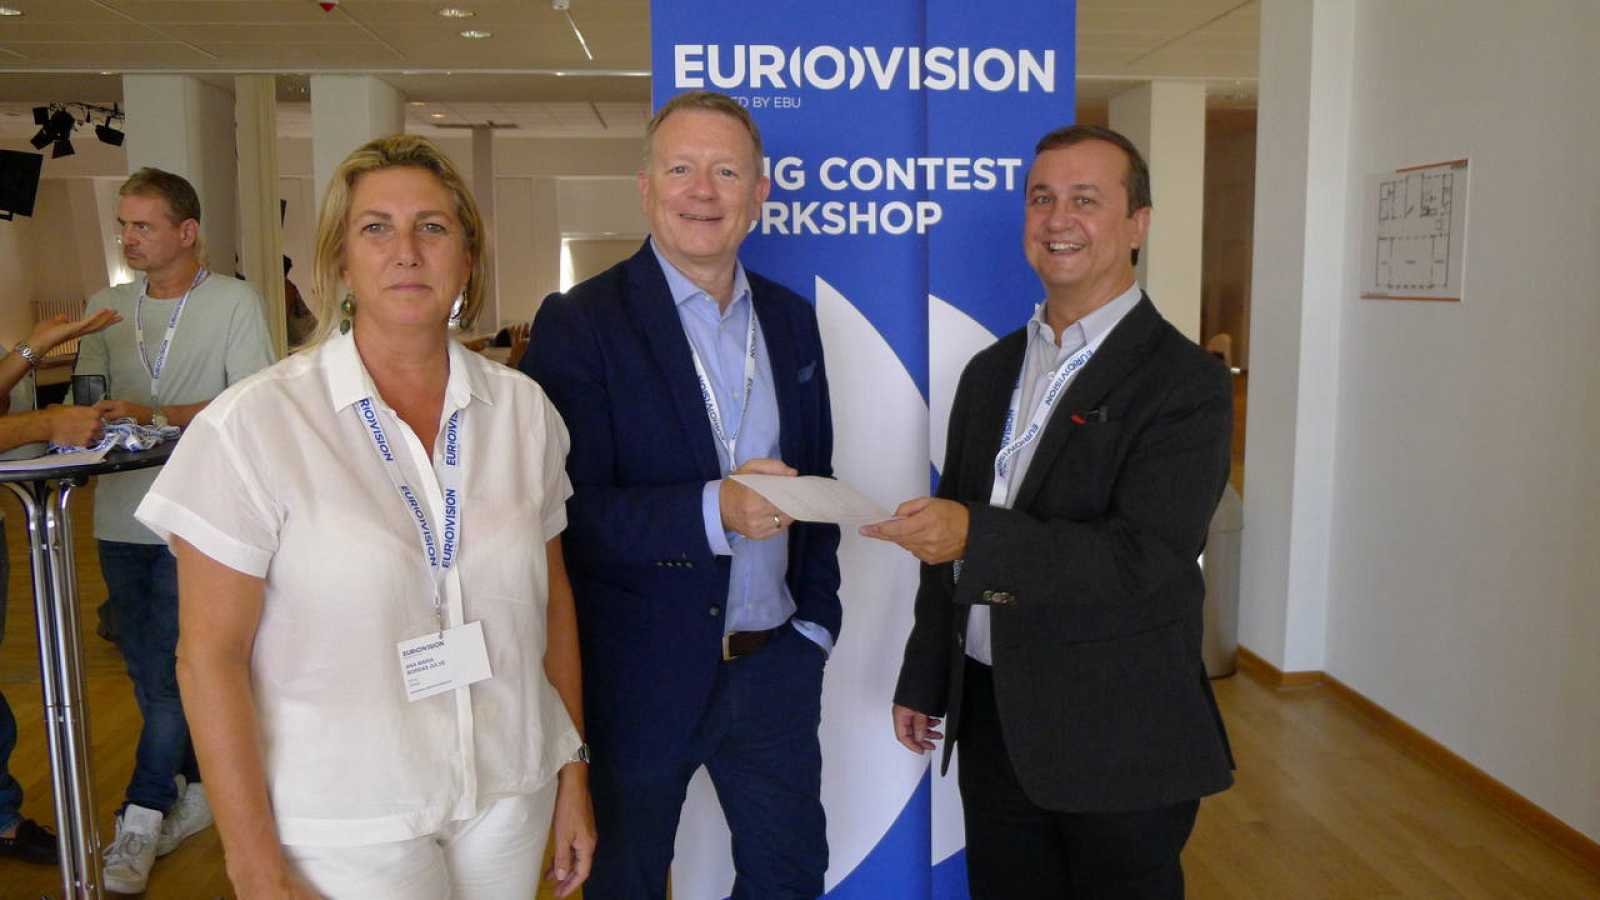 Ana Mª. Bordas y Federico Llano (RTVE) entregan a Jon Ola Sand (UER) la solicitud de participación para Eurovisión 2017